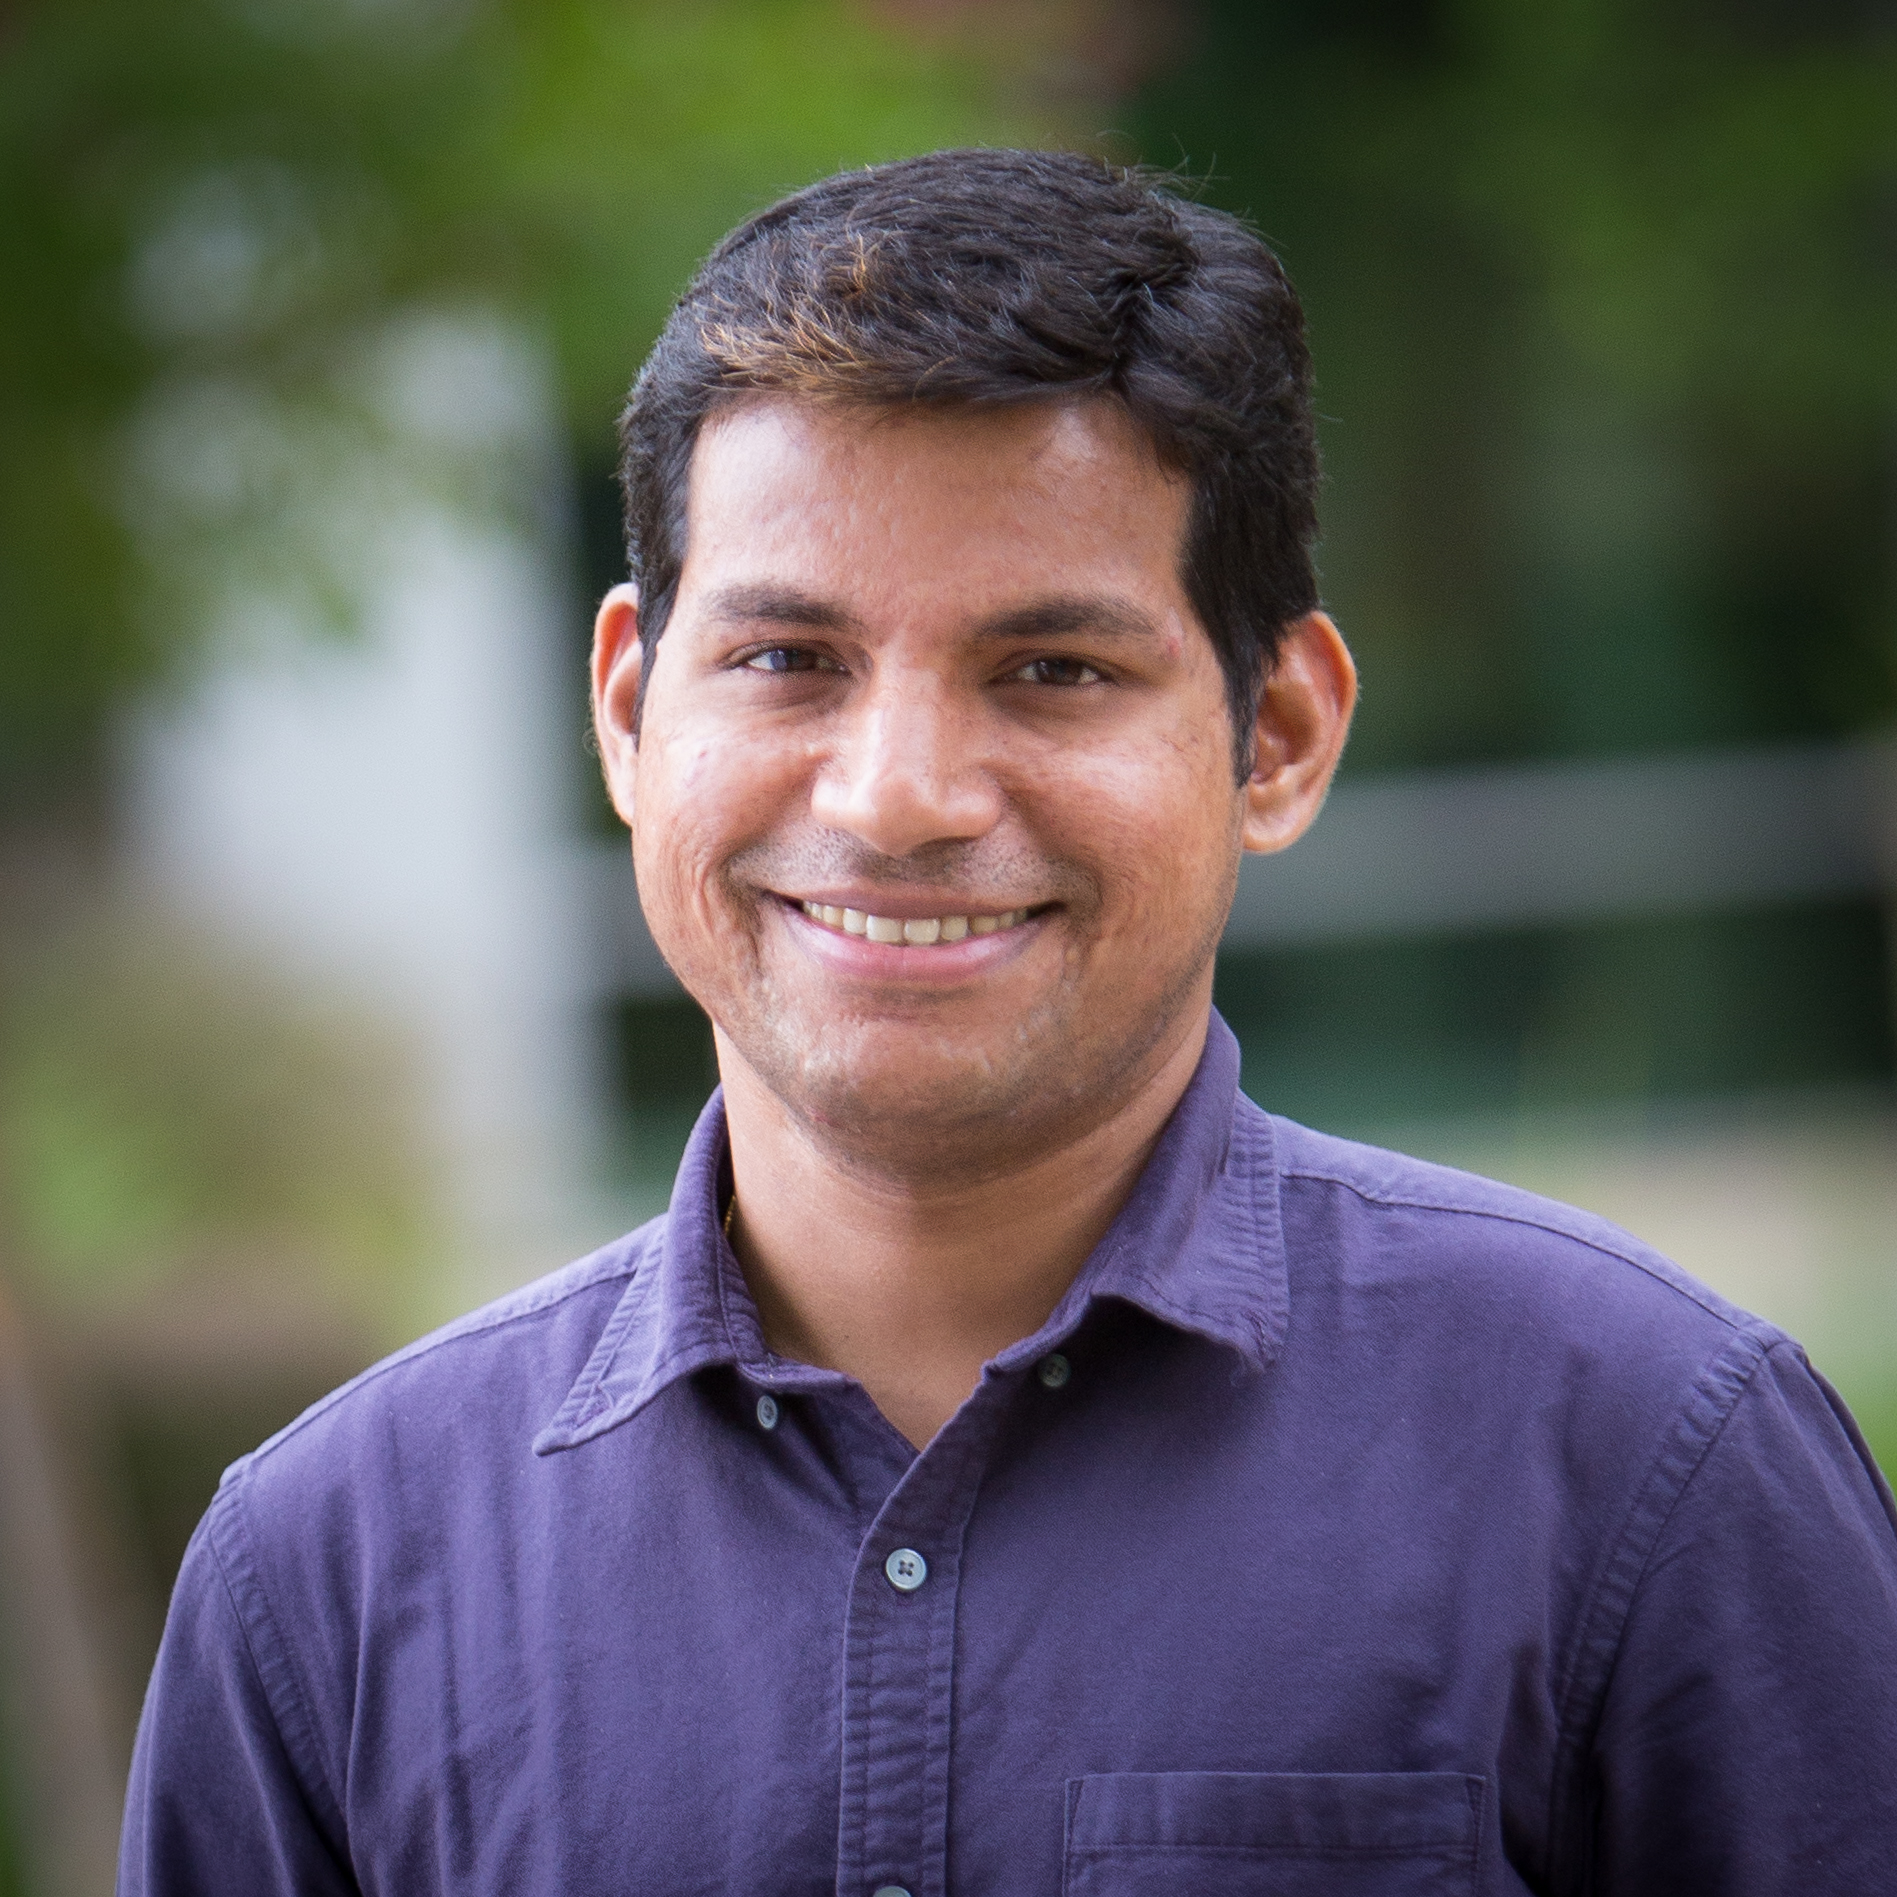 Vijay Gaonkar